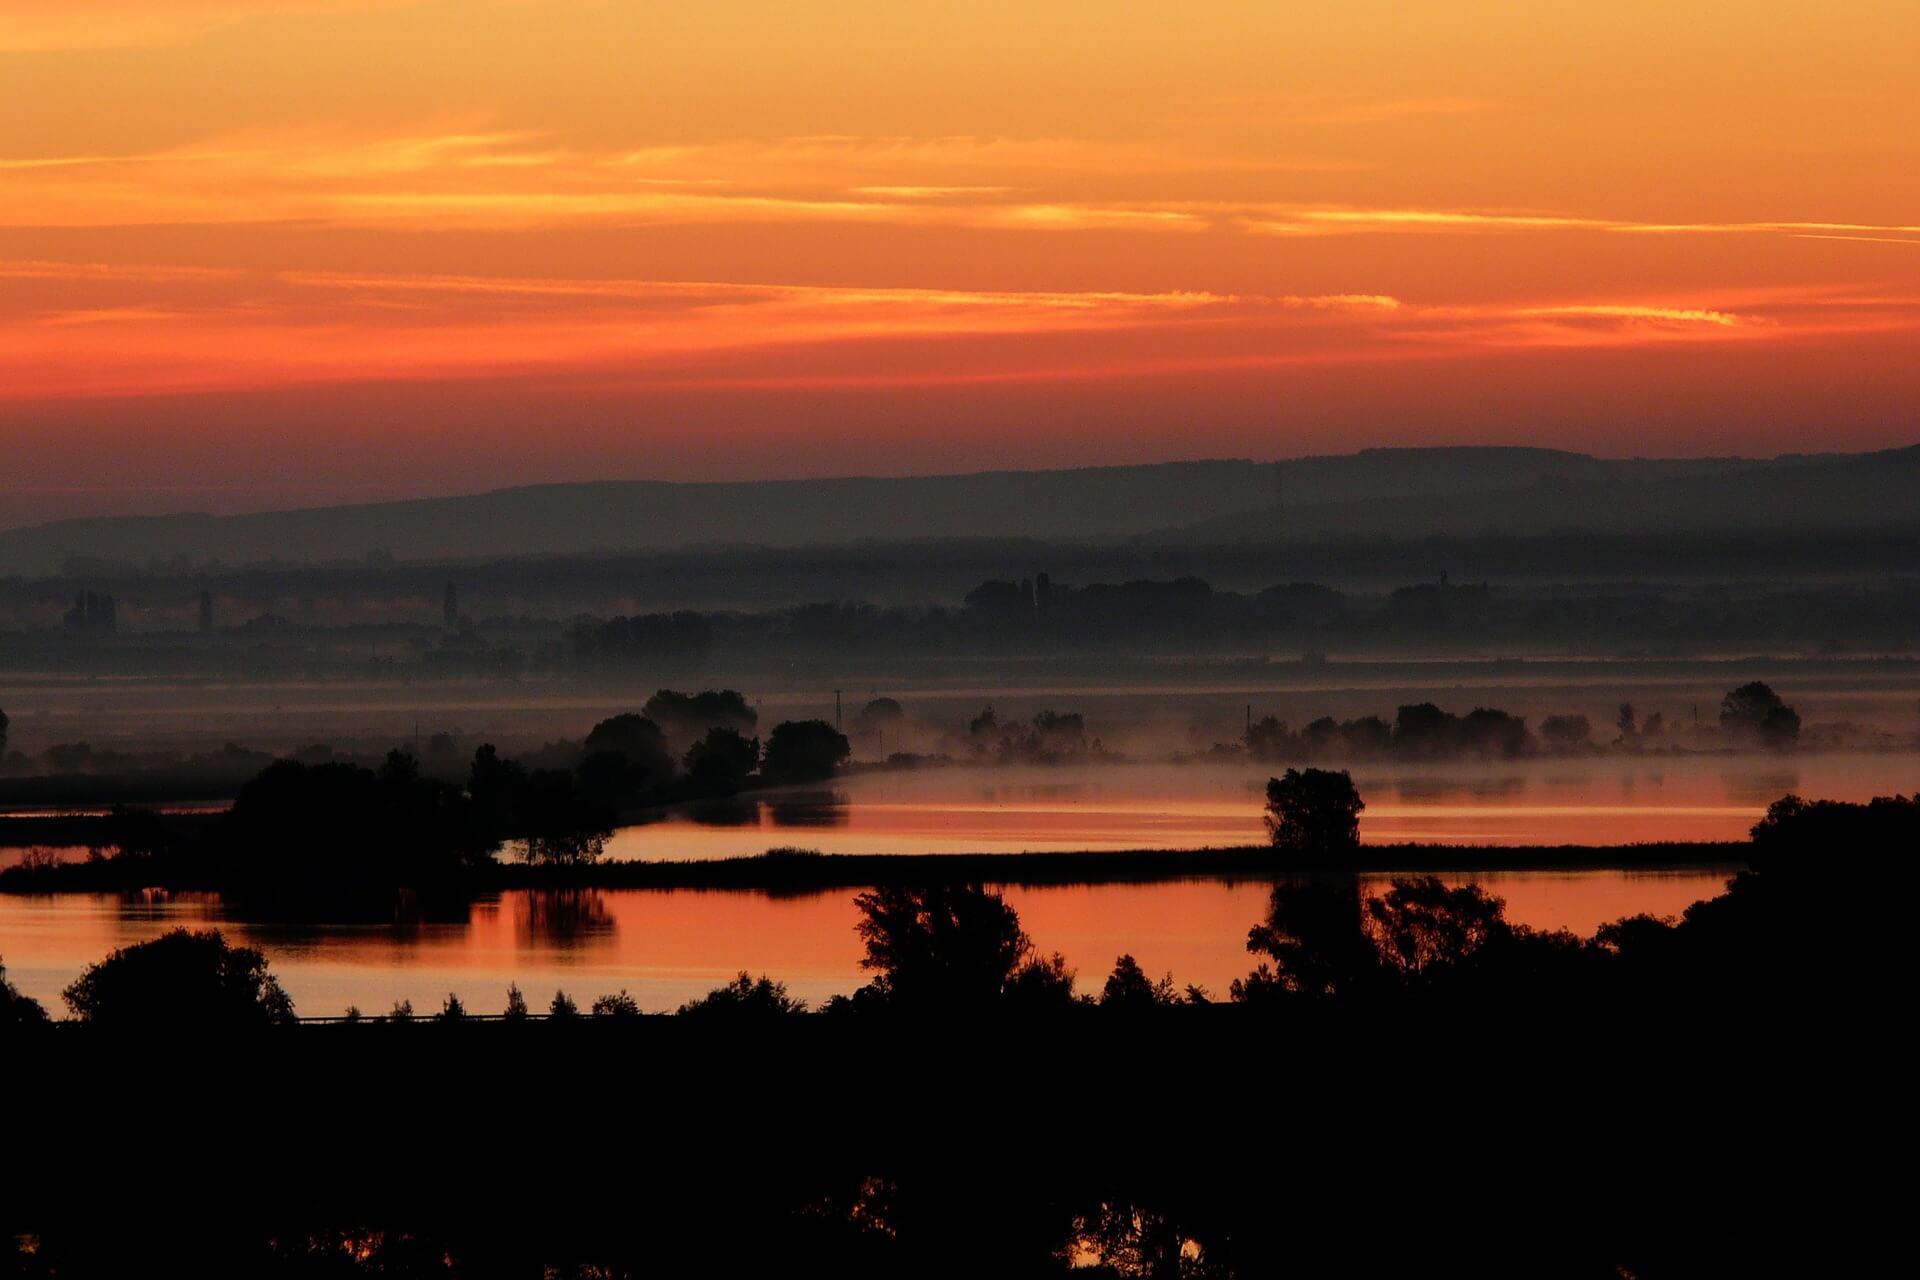 sunset-114557_1920